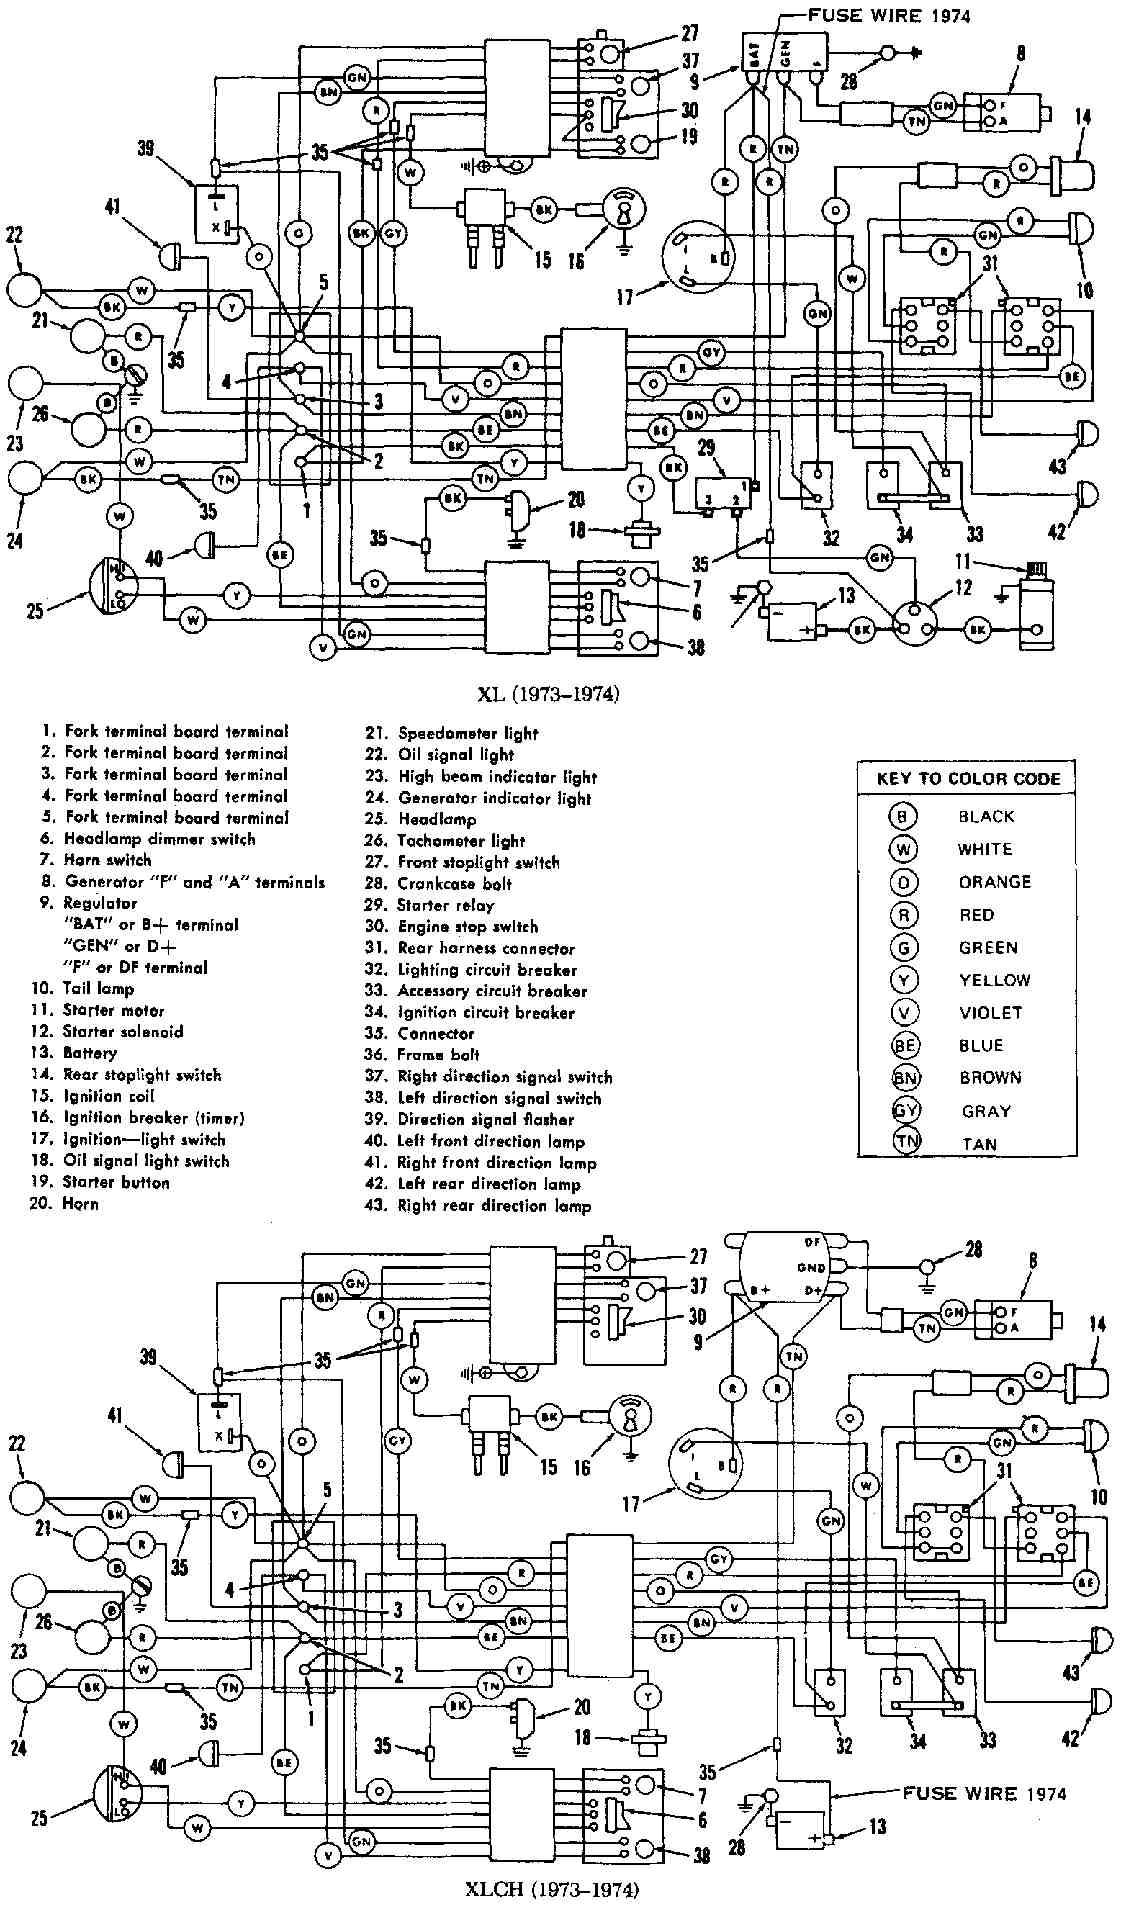 wiring diagram on 1972 harley davidson electra glide wiring diagram rh abetter pw